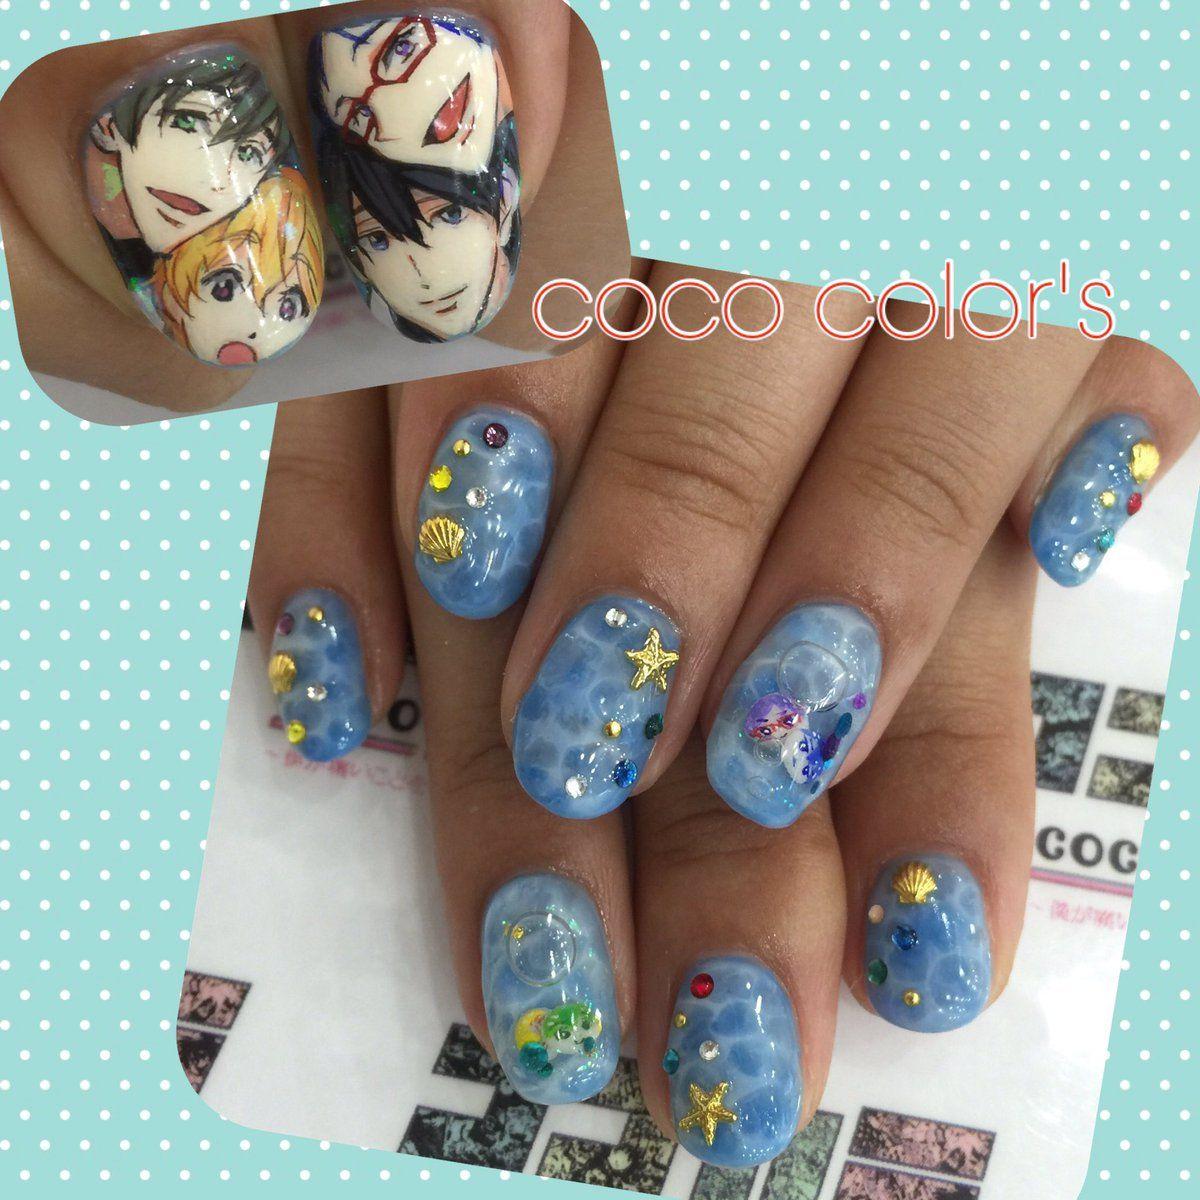 Anime nail art free haruka nanase rei ryugazaki nagisa hazuki anime nail art free haruka nanase rei ryugazaki nagisa hazuki makototachibana prinsesfo Gallery